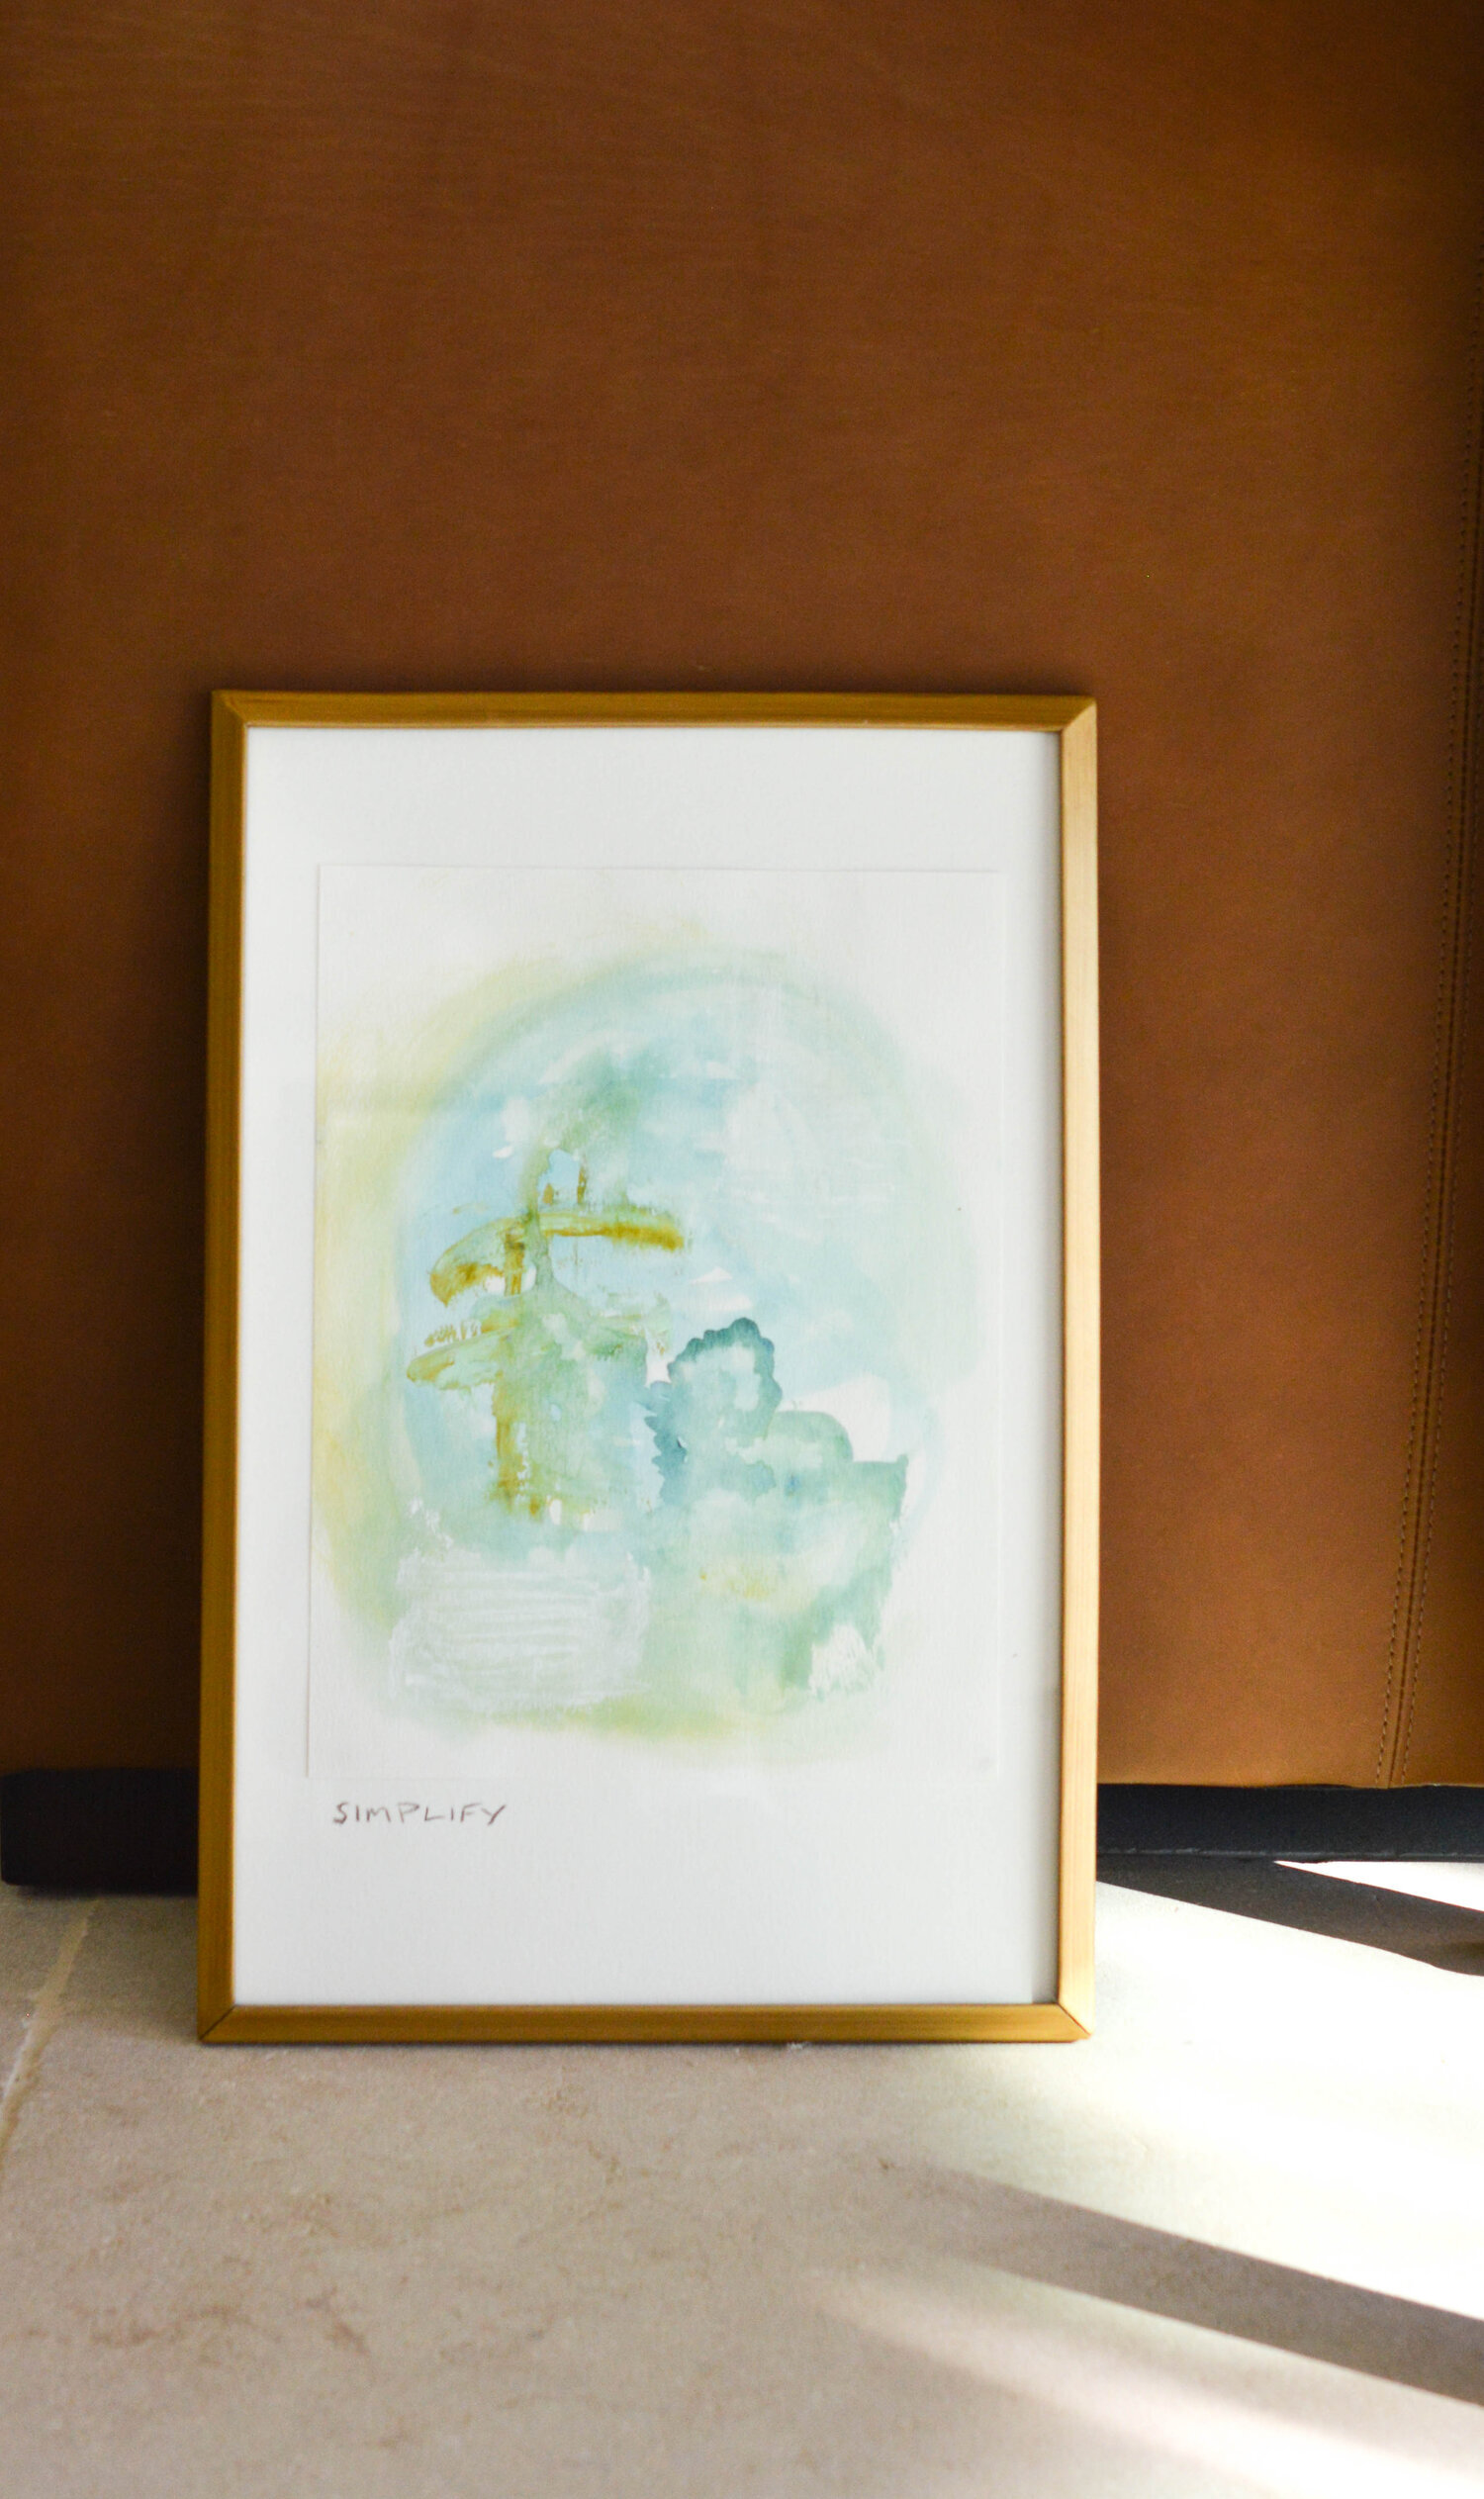 Simplify-elizabeth-irvine-framed.JPG